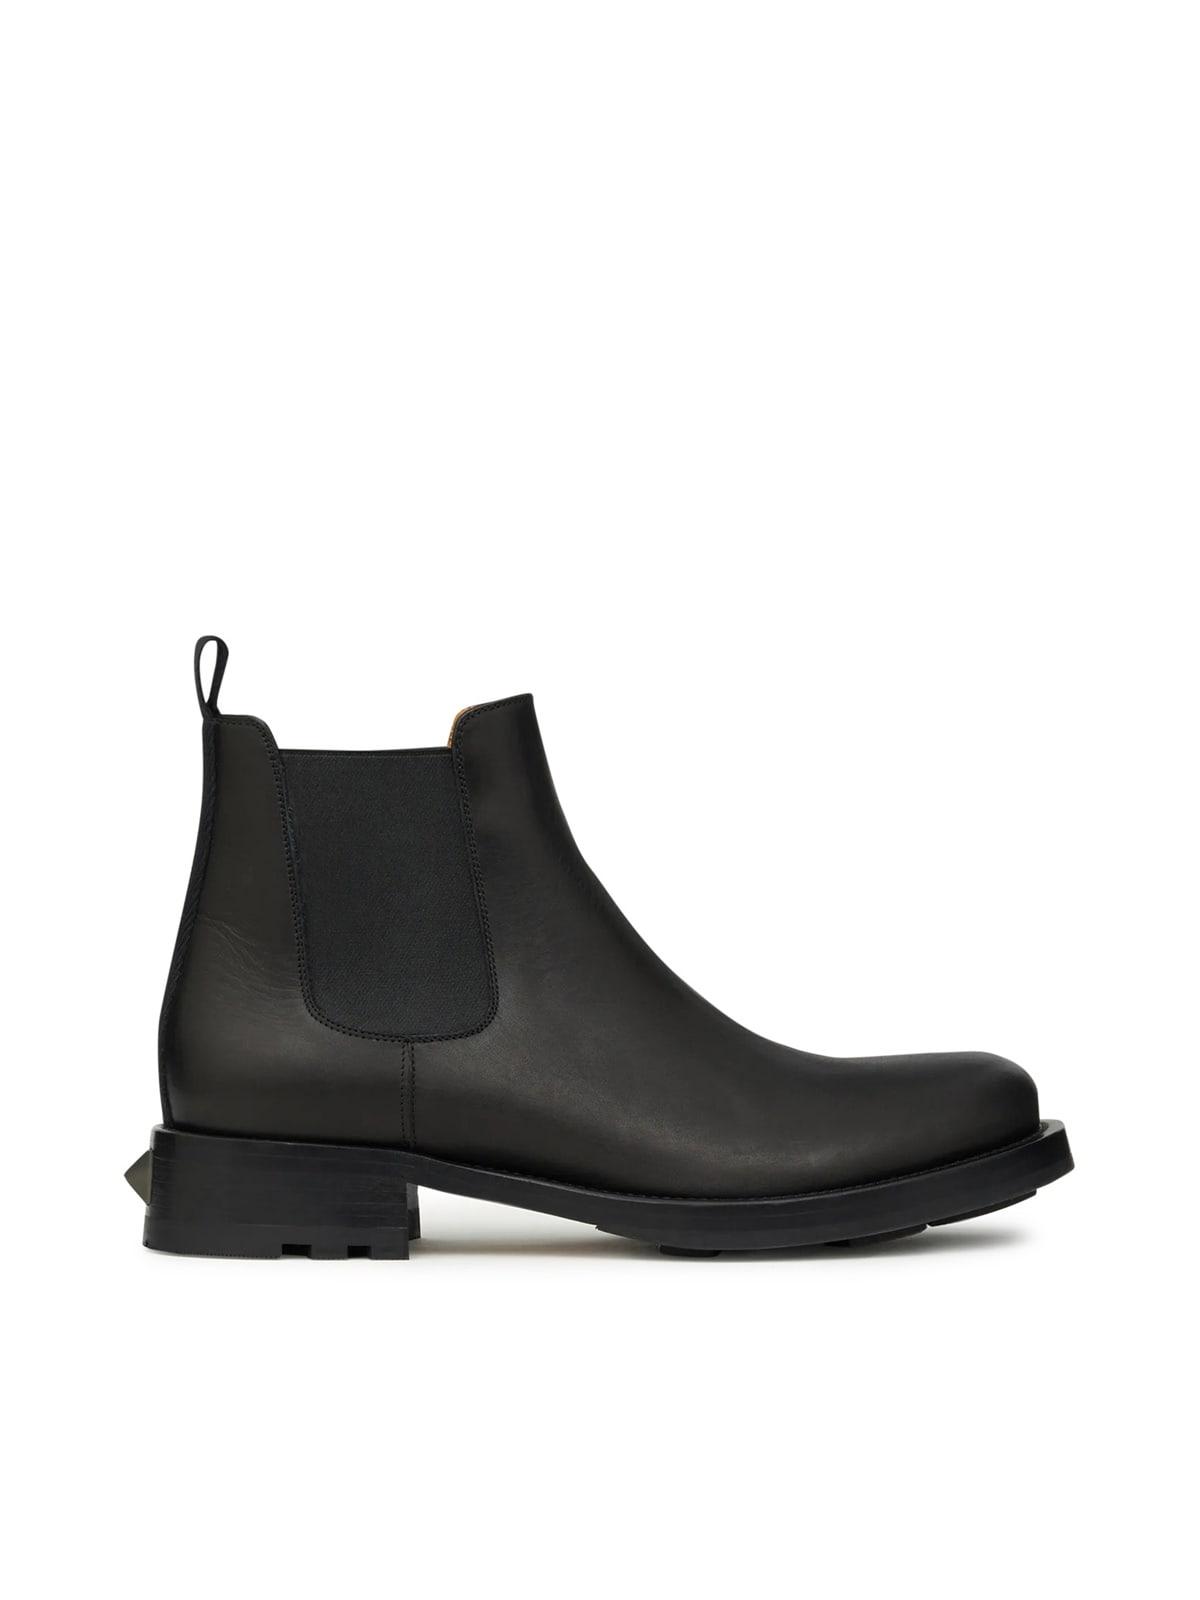 Valentino Beatle Boots